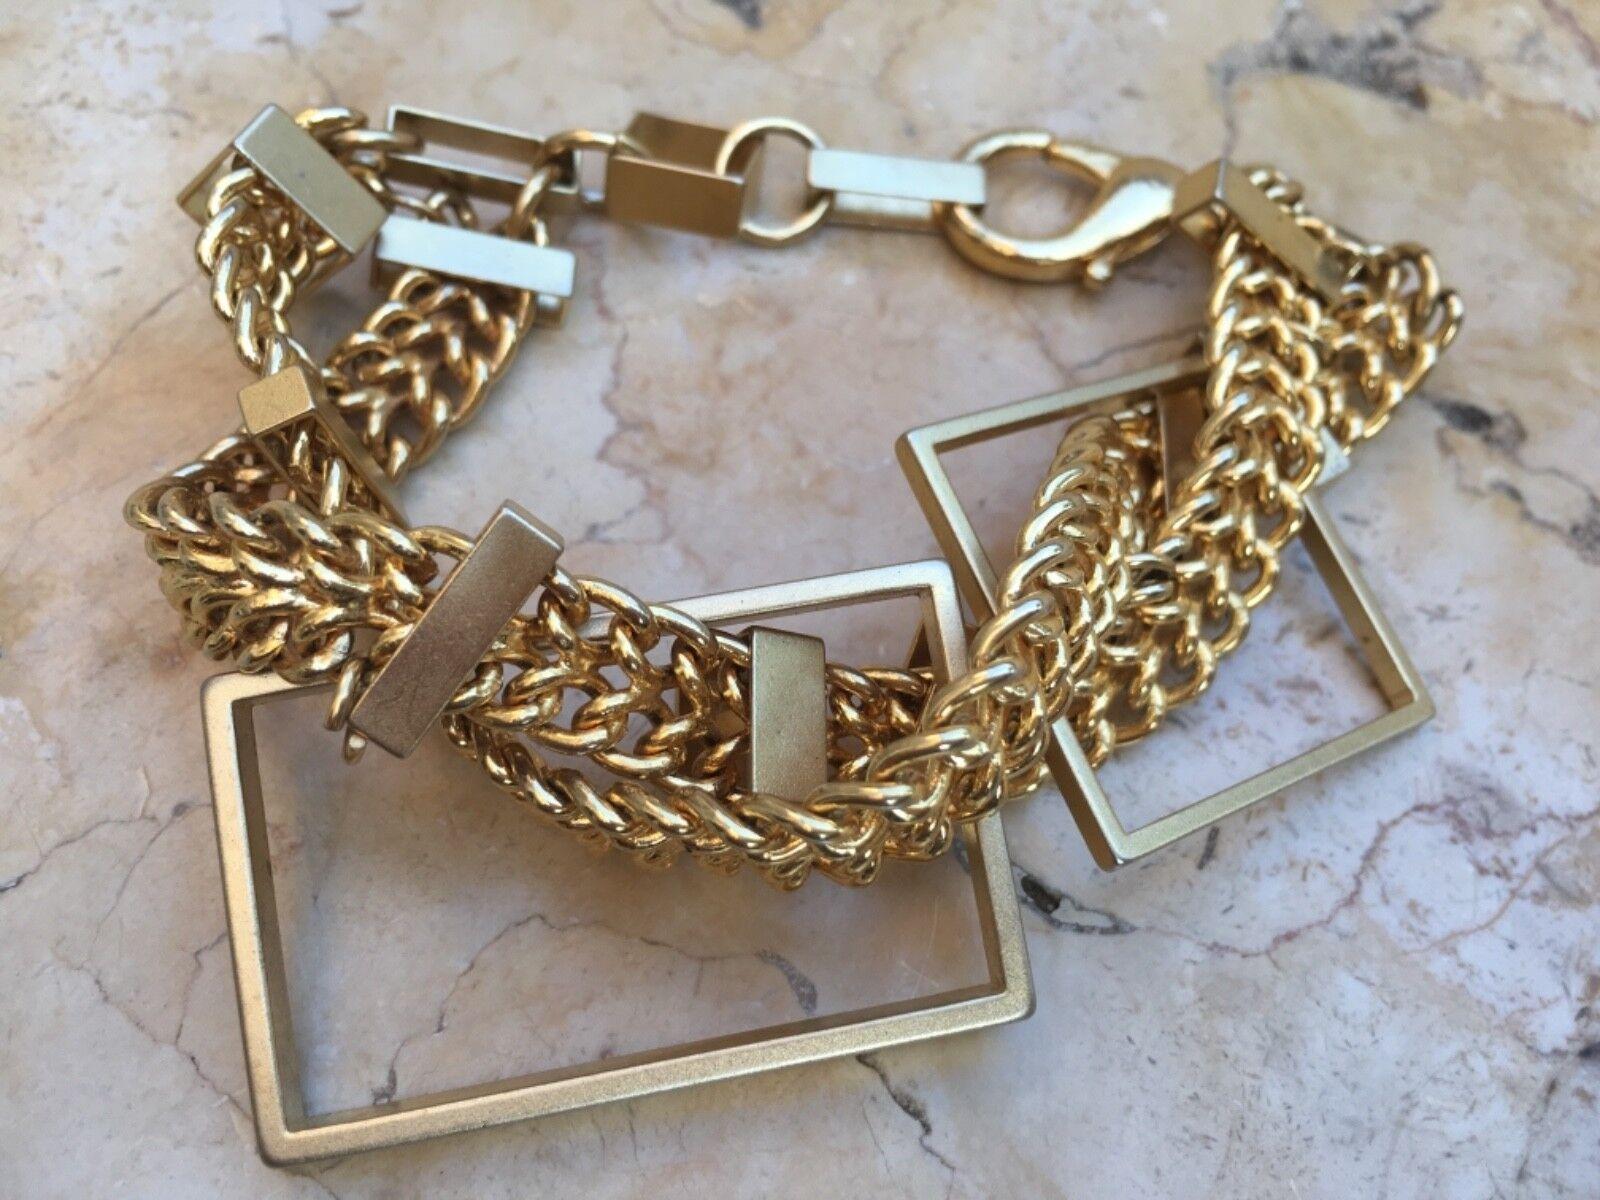 Vintage Rare Bracelet Twist Chain Women's Fashion Jewelry 58 grams